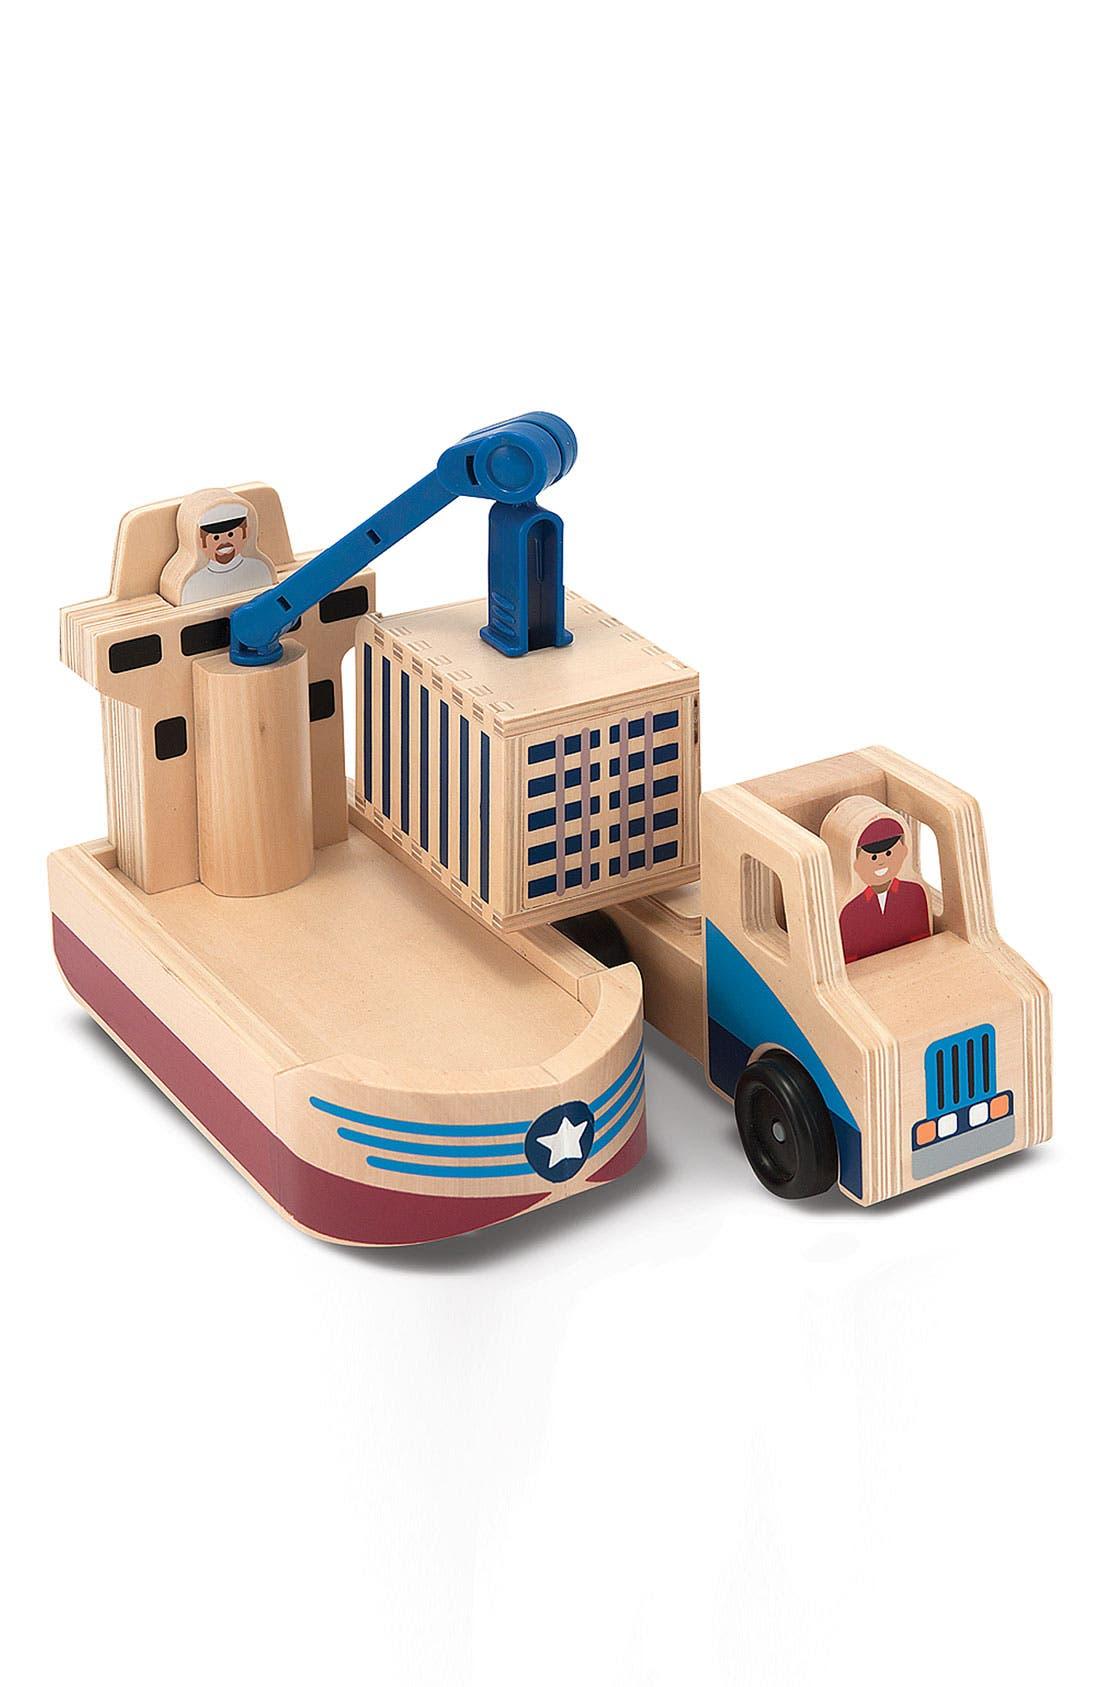 Main Image - Melissa & Doug 'Whittle World' Cargo Ship & Truck Wooden Toy